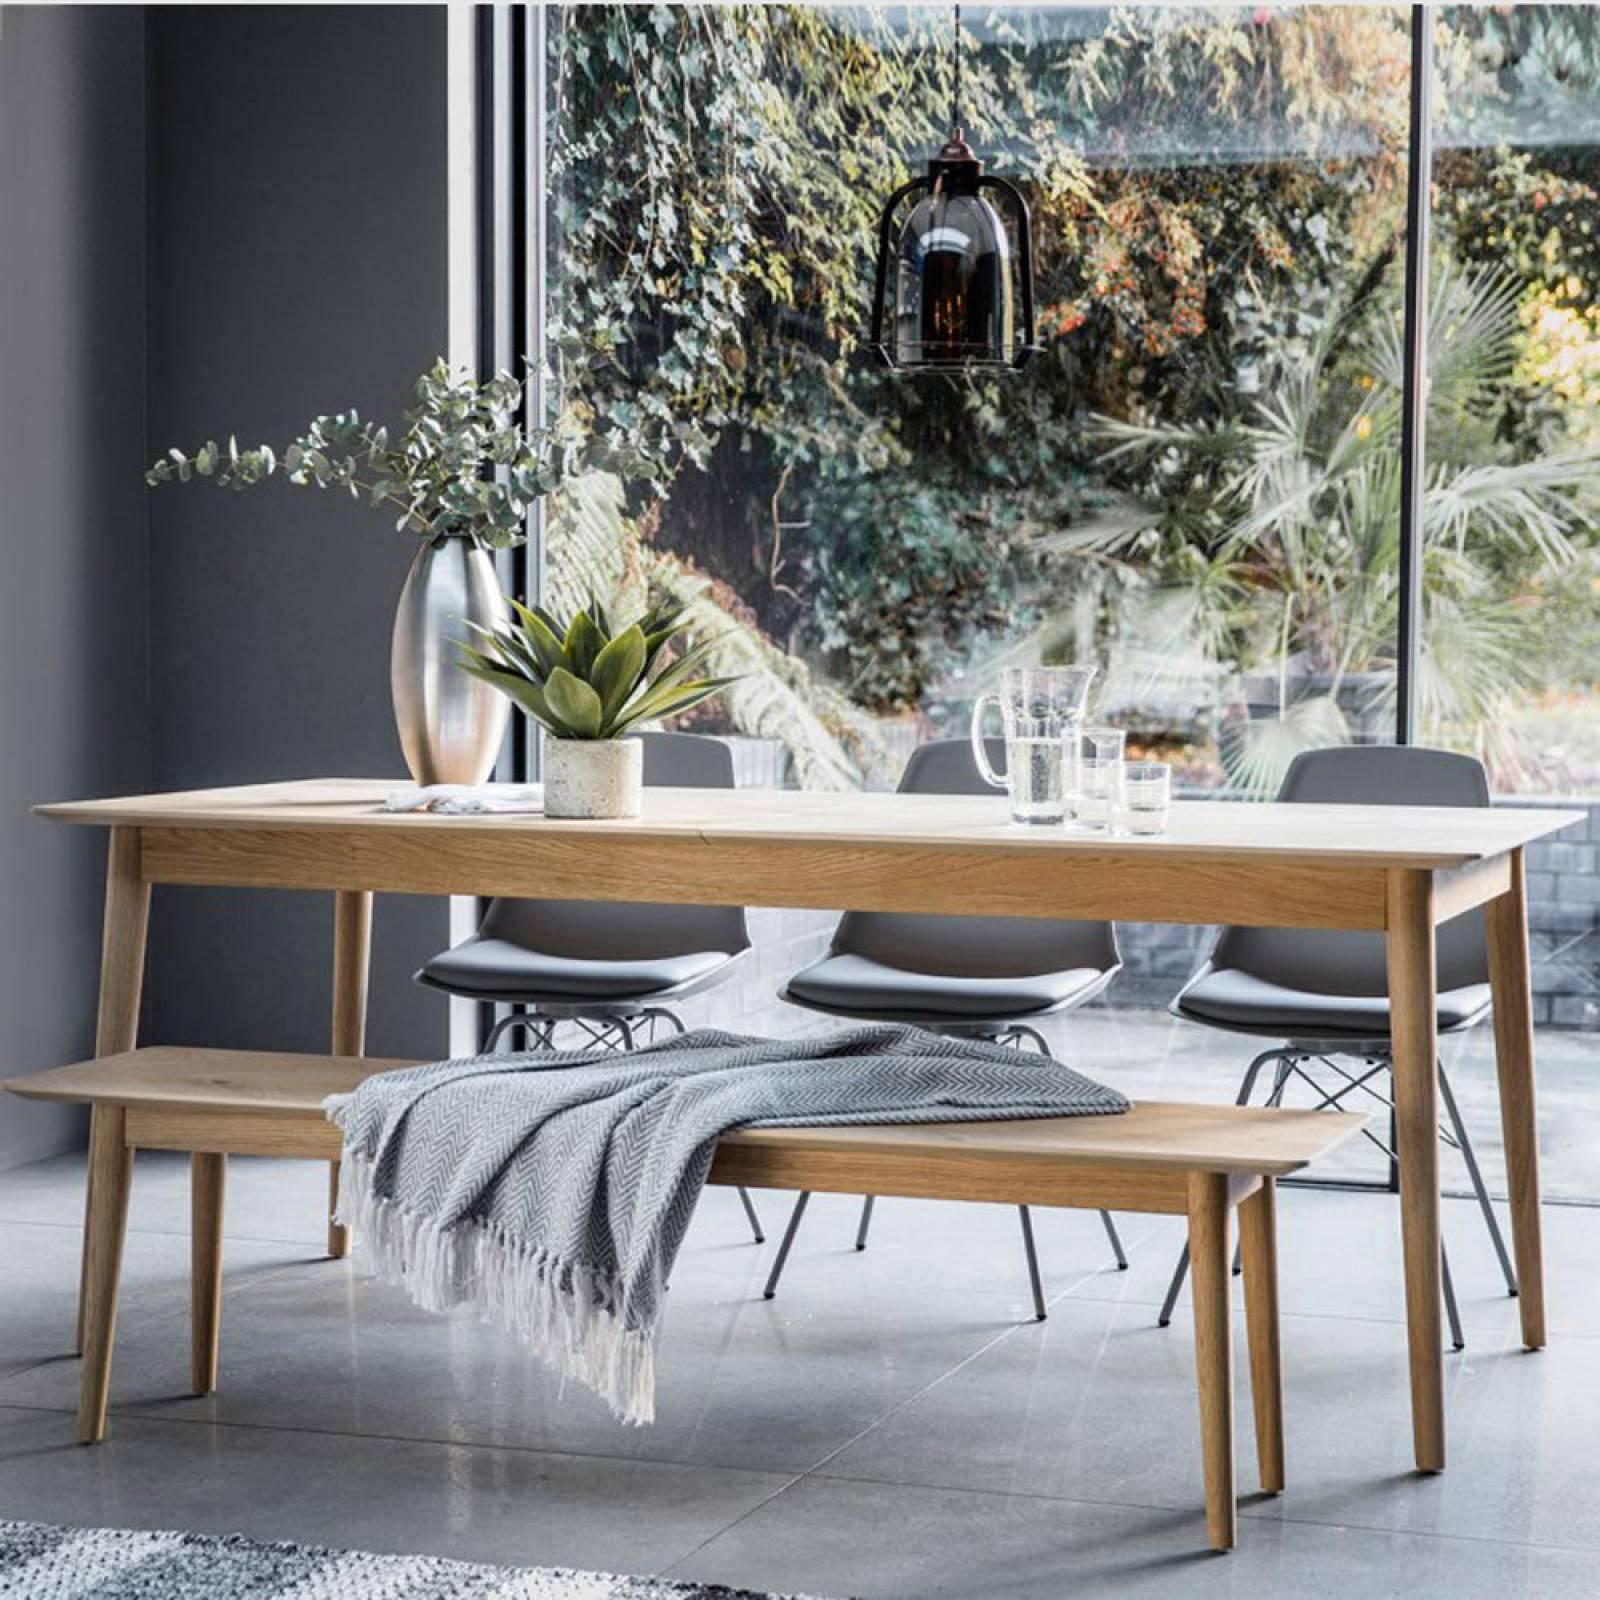 Extending Milano Oak Dining Table